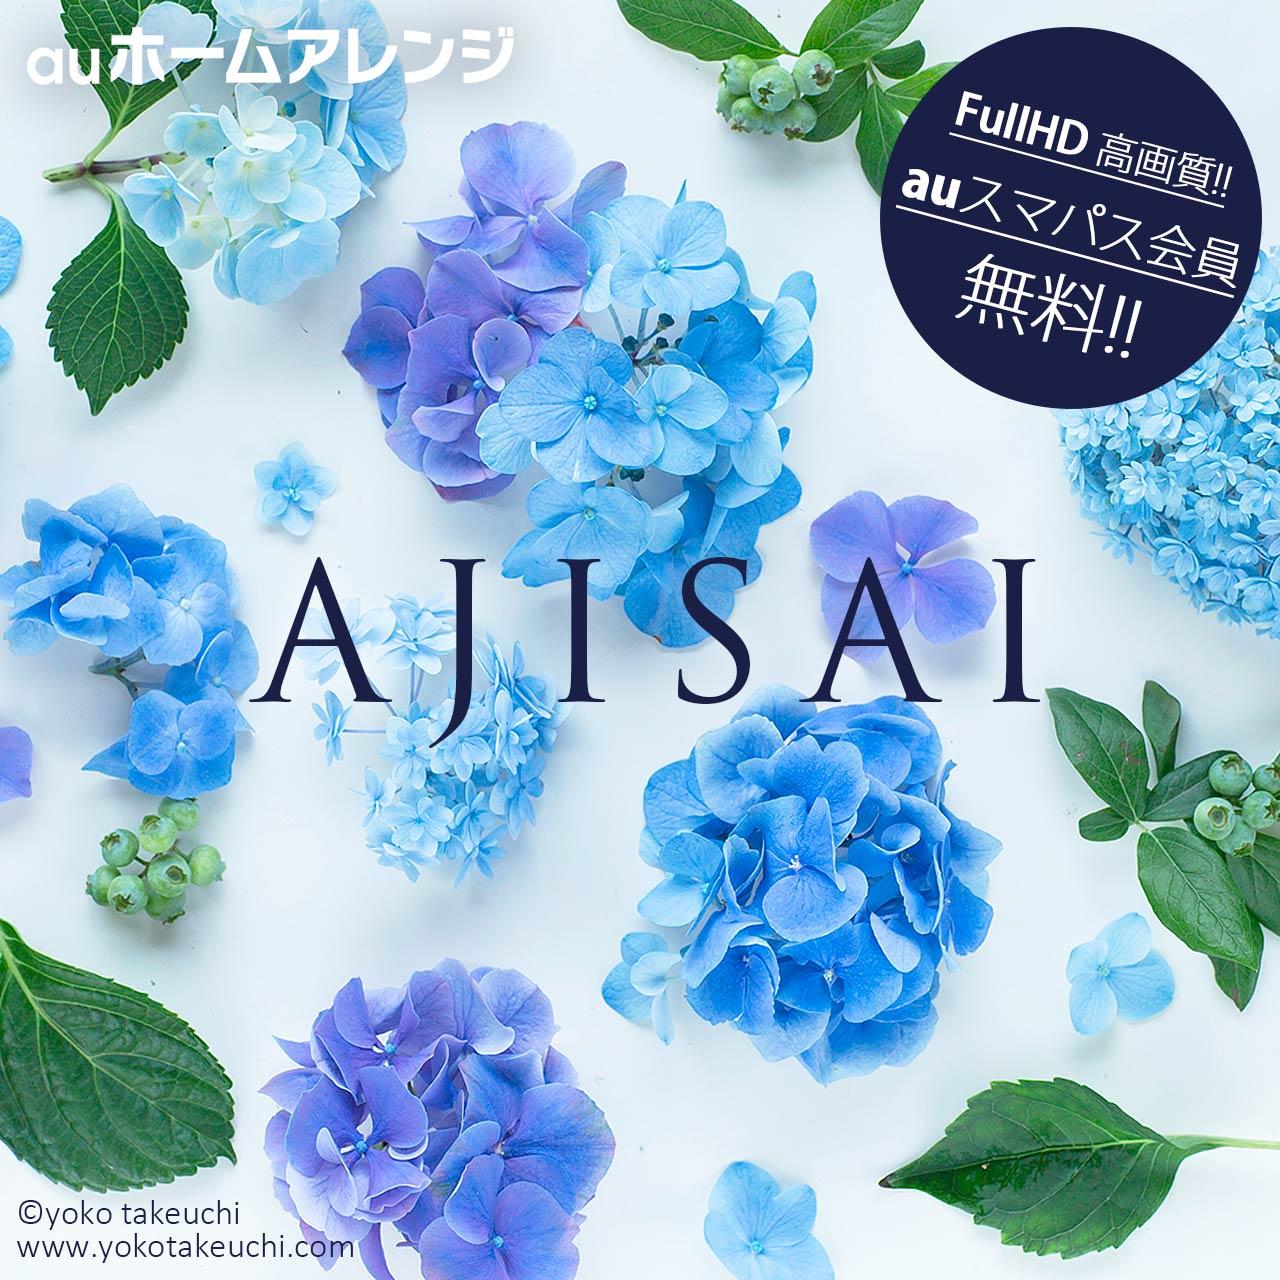 Au スマートパス 壁紙 19 竹内陽子 Yokotakeuchi フラワーアーティスト Flower Artist 写真家 フォトグラファー